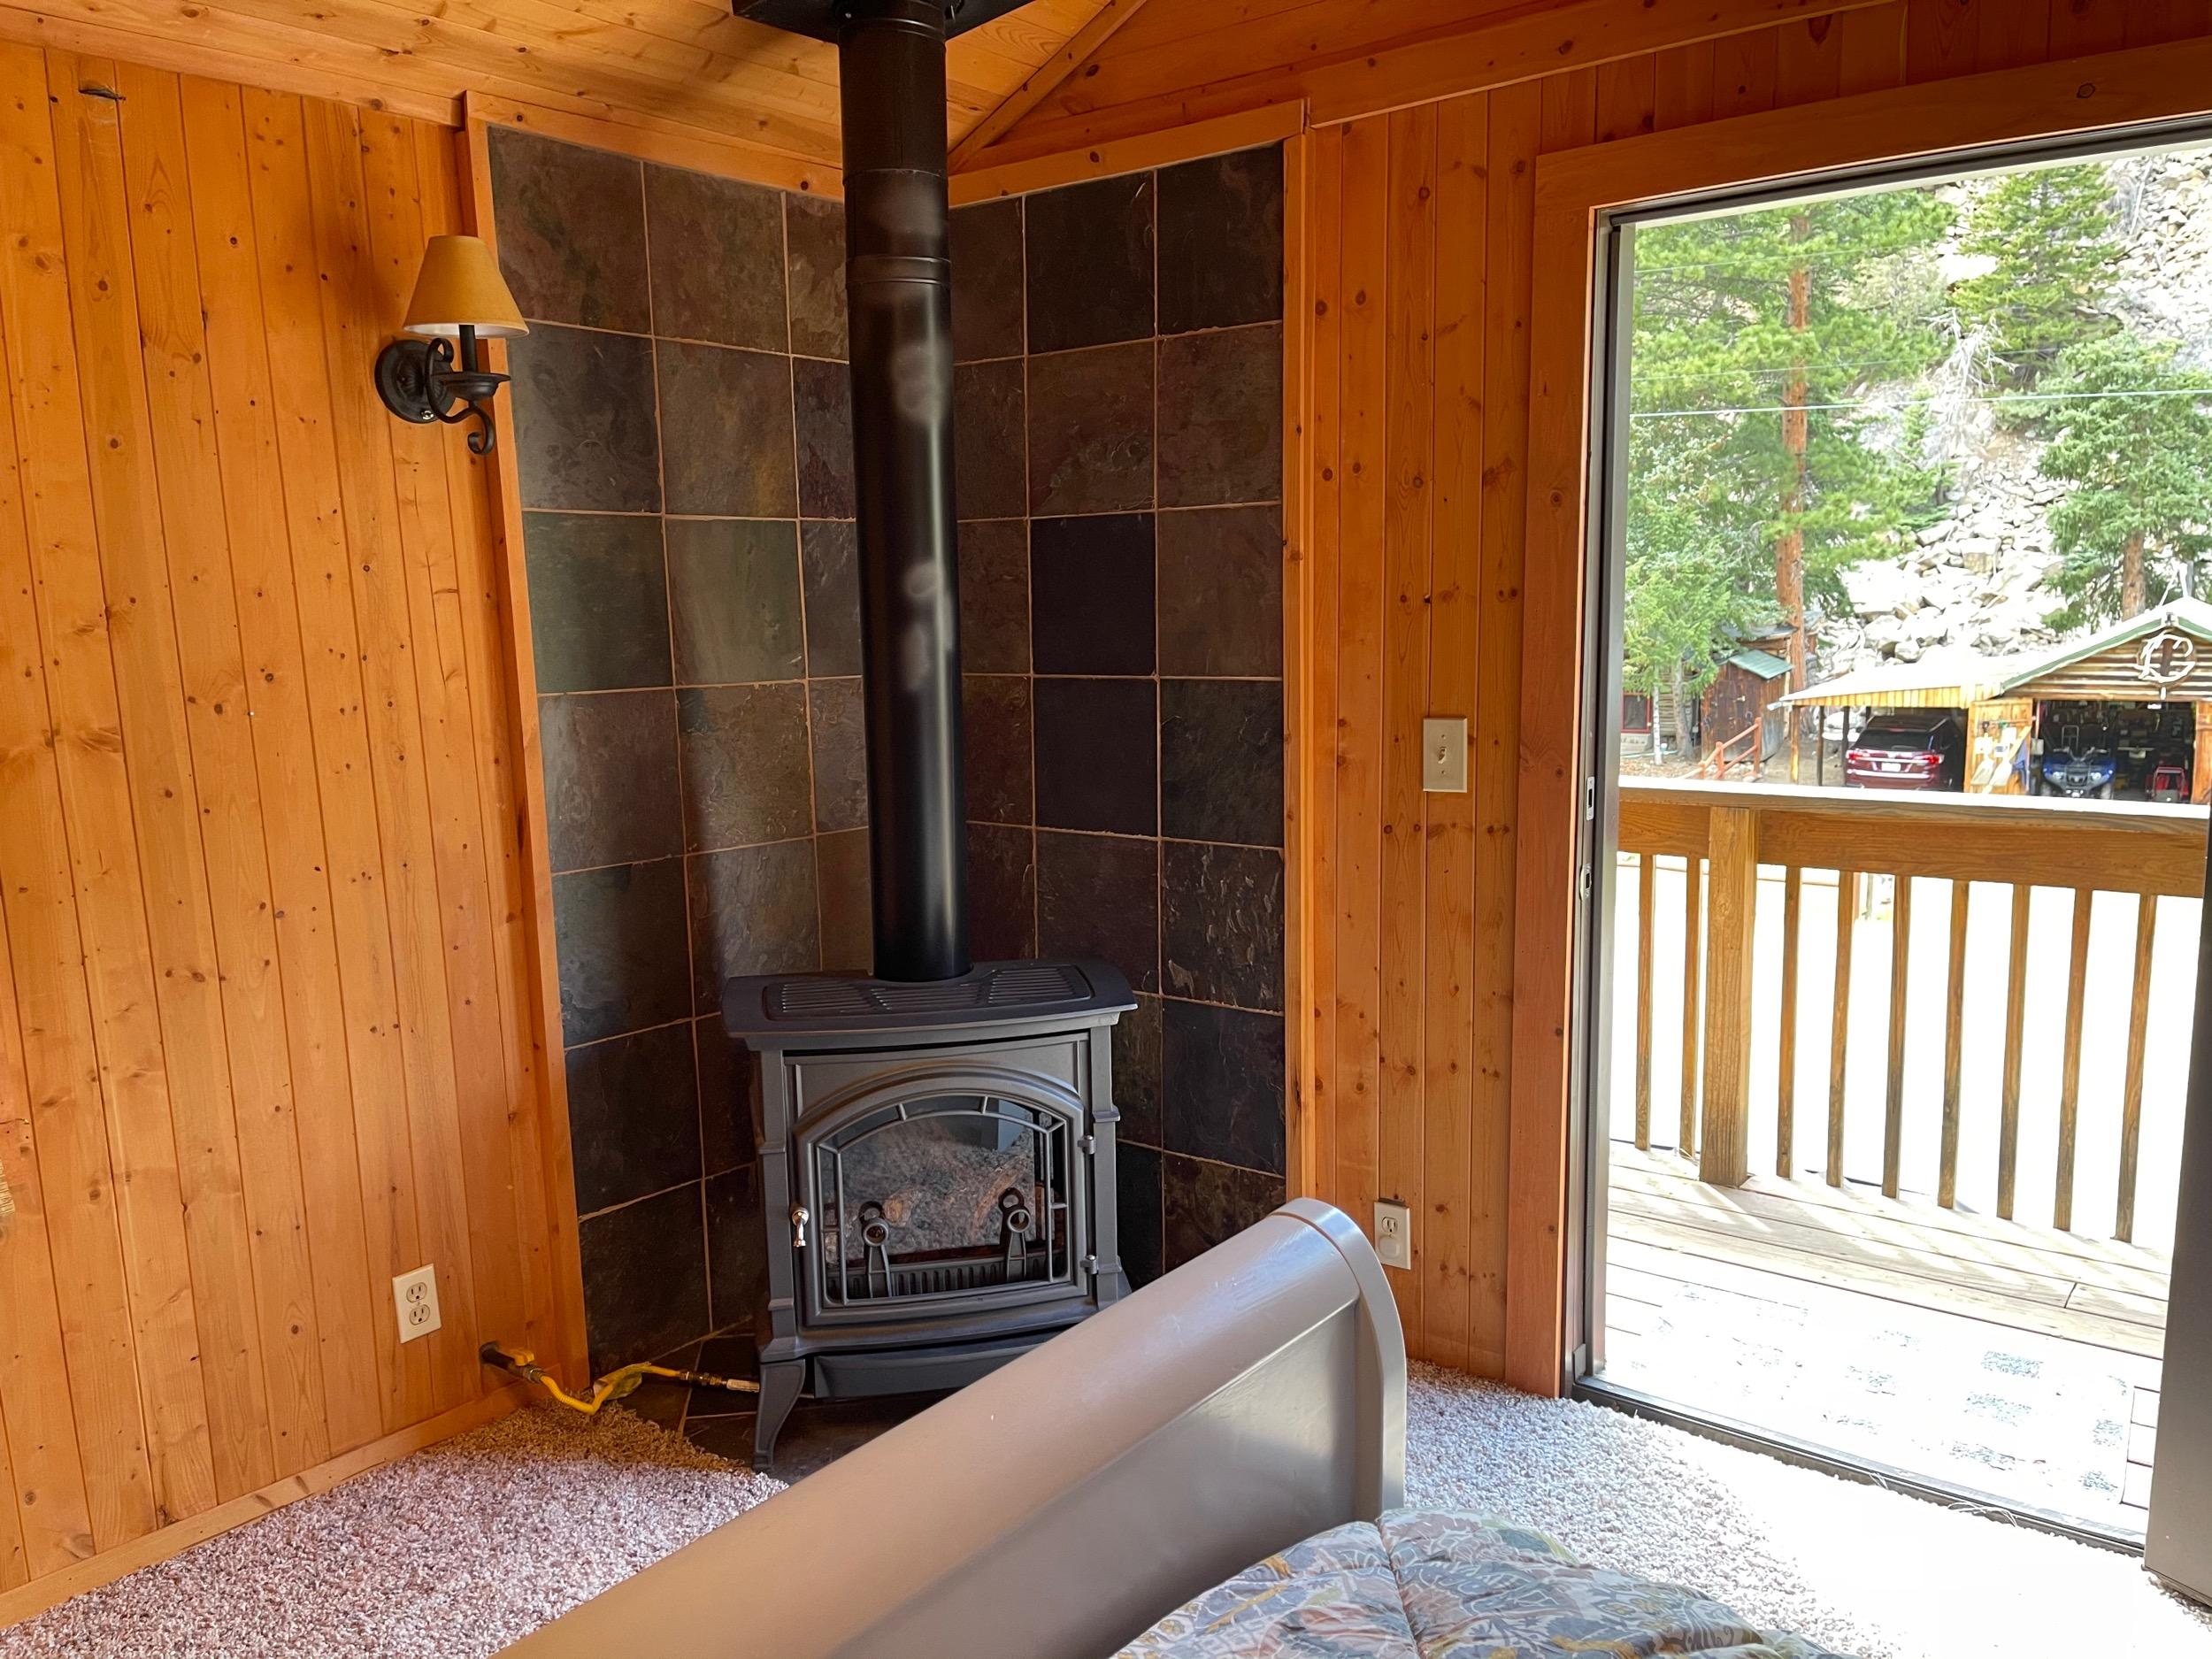 Freestanding gas fireplace in bedroom